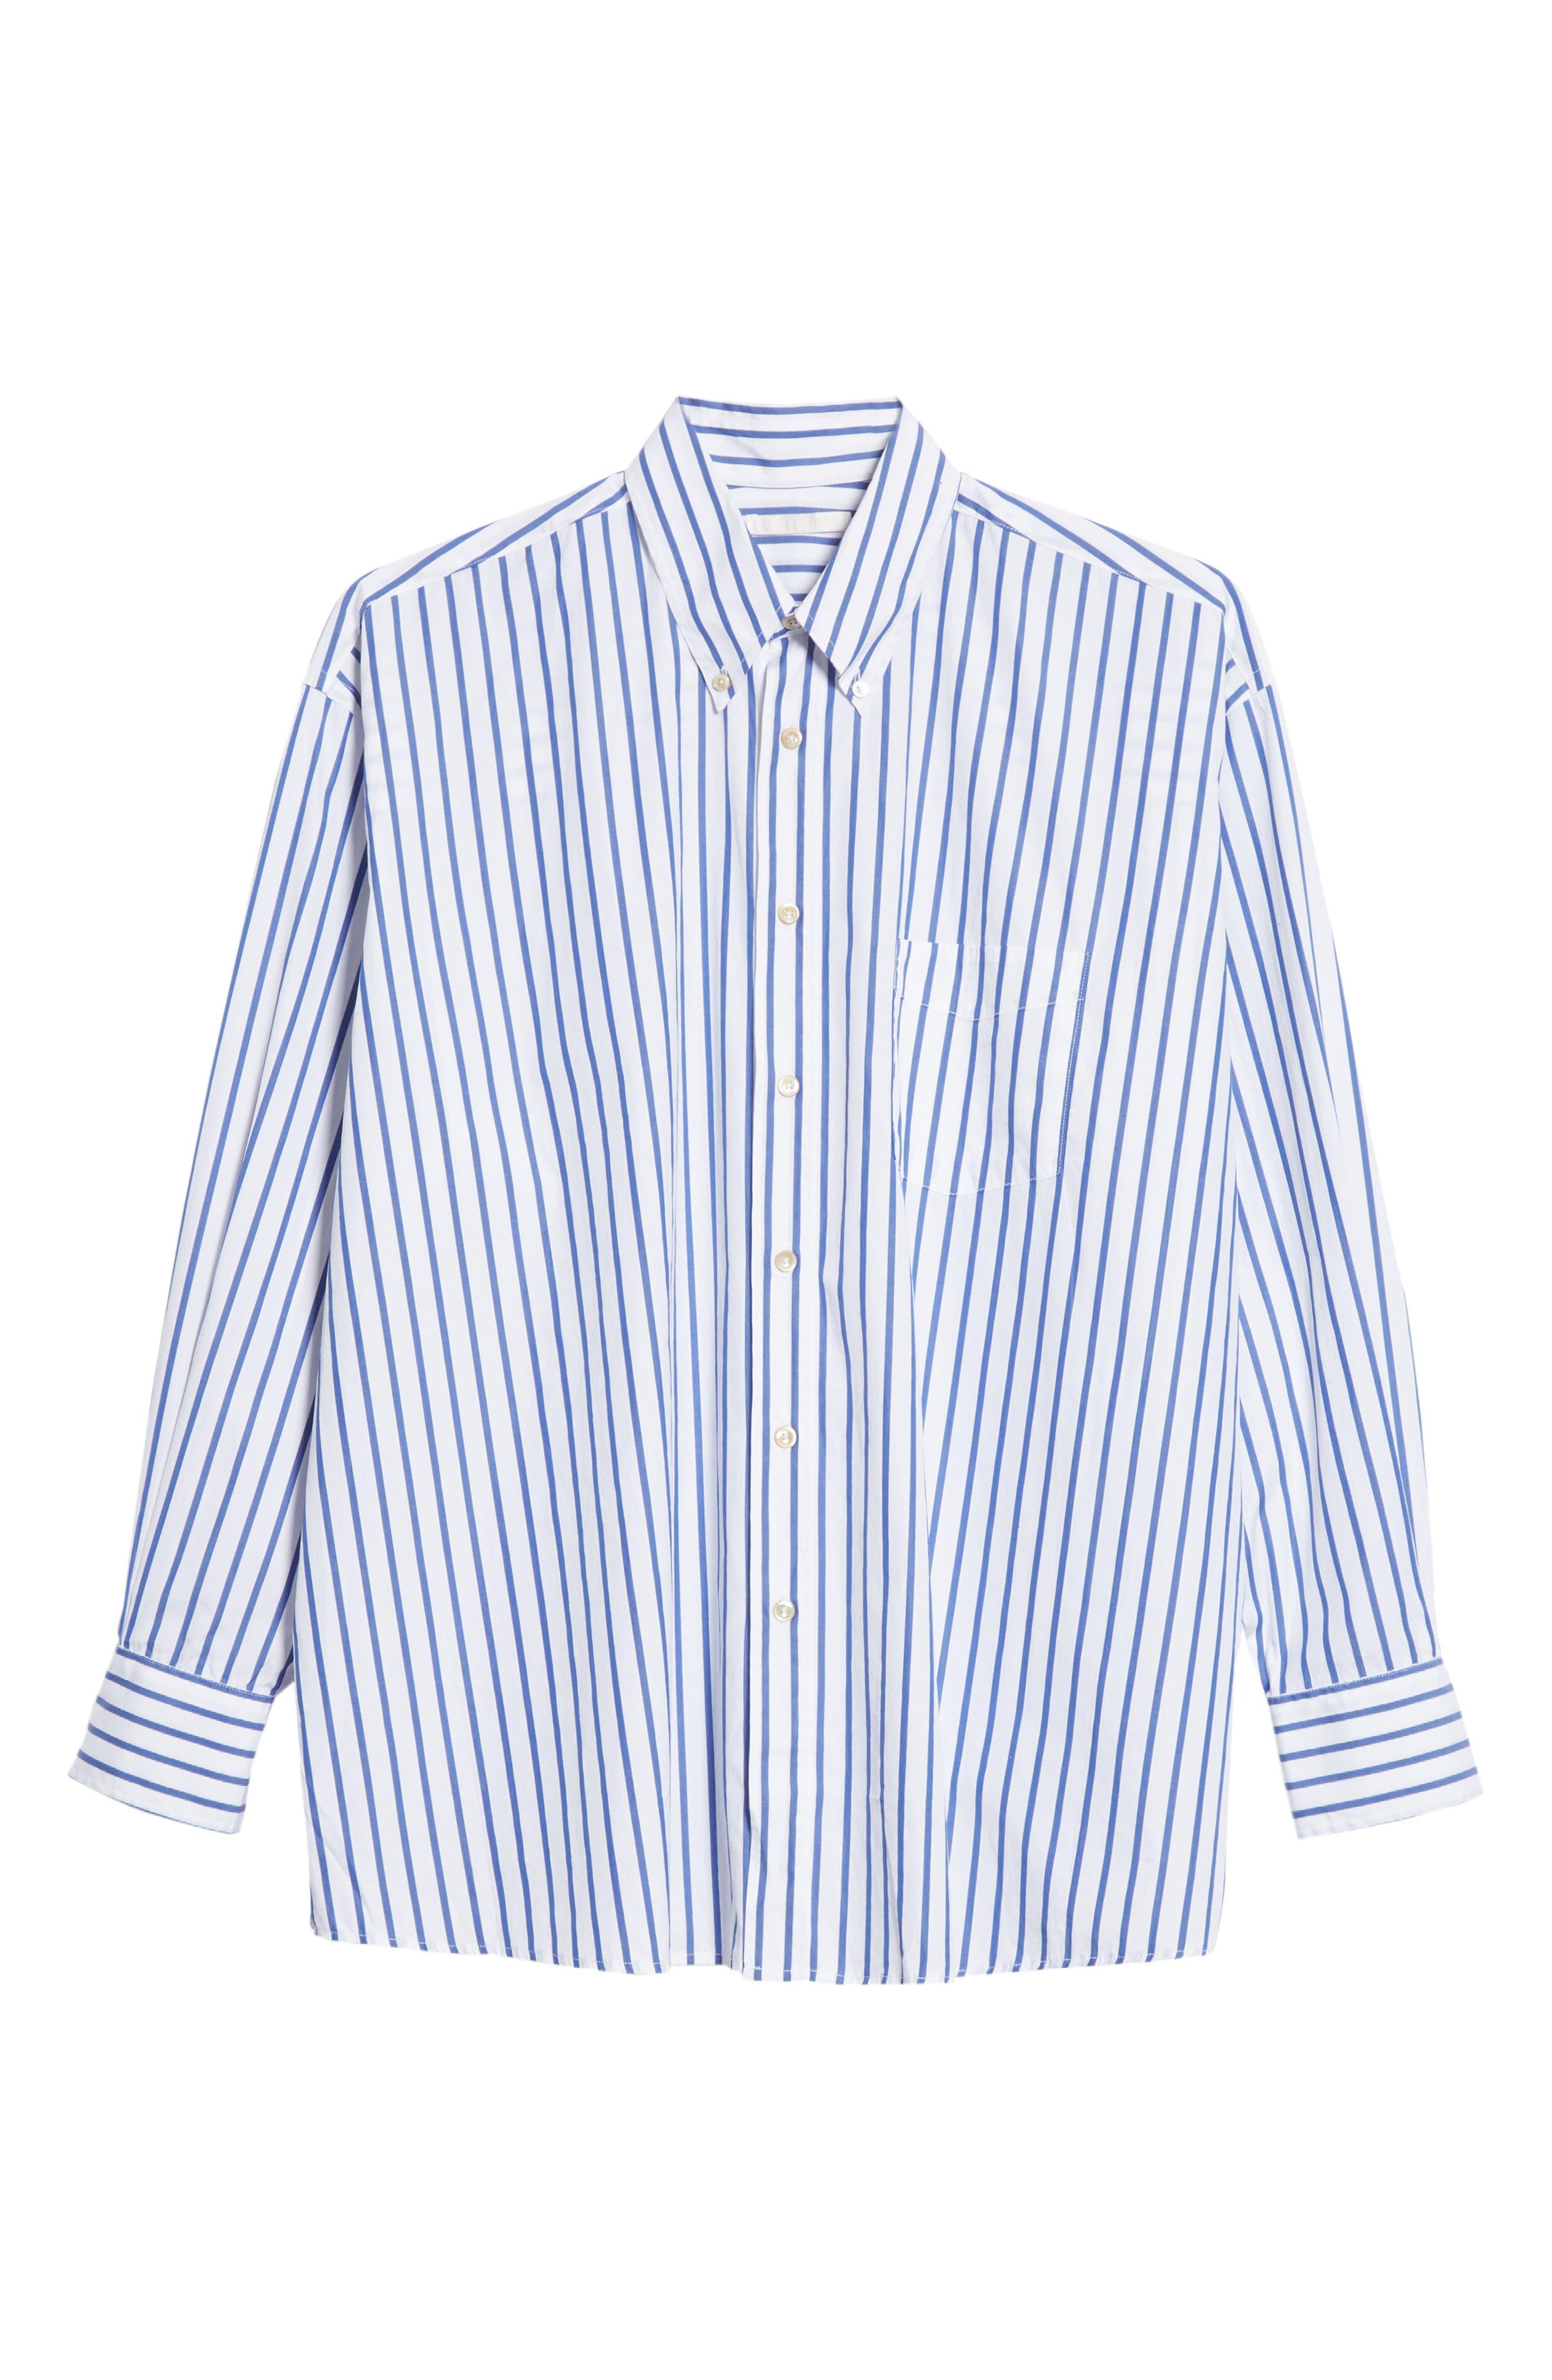 Oversize Stripe Woven Shirt,                             Alternate thumbnail 6, color,                             400